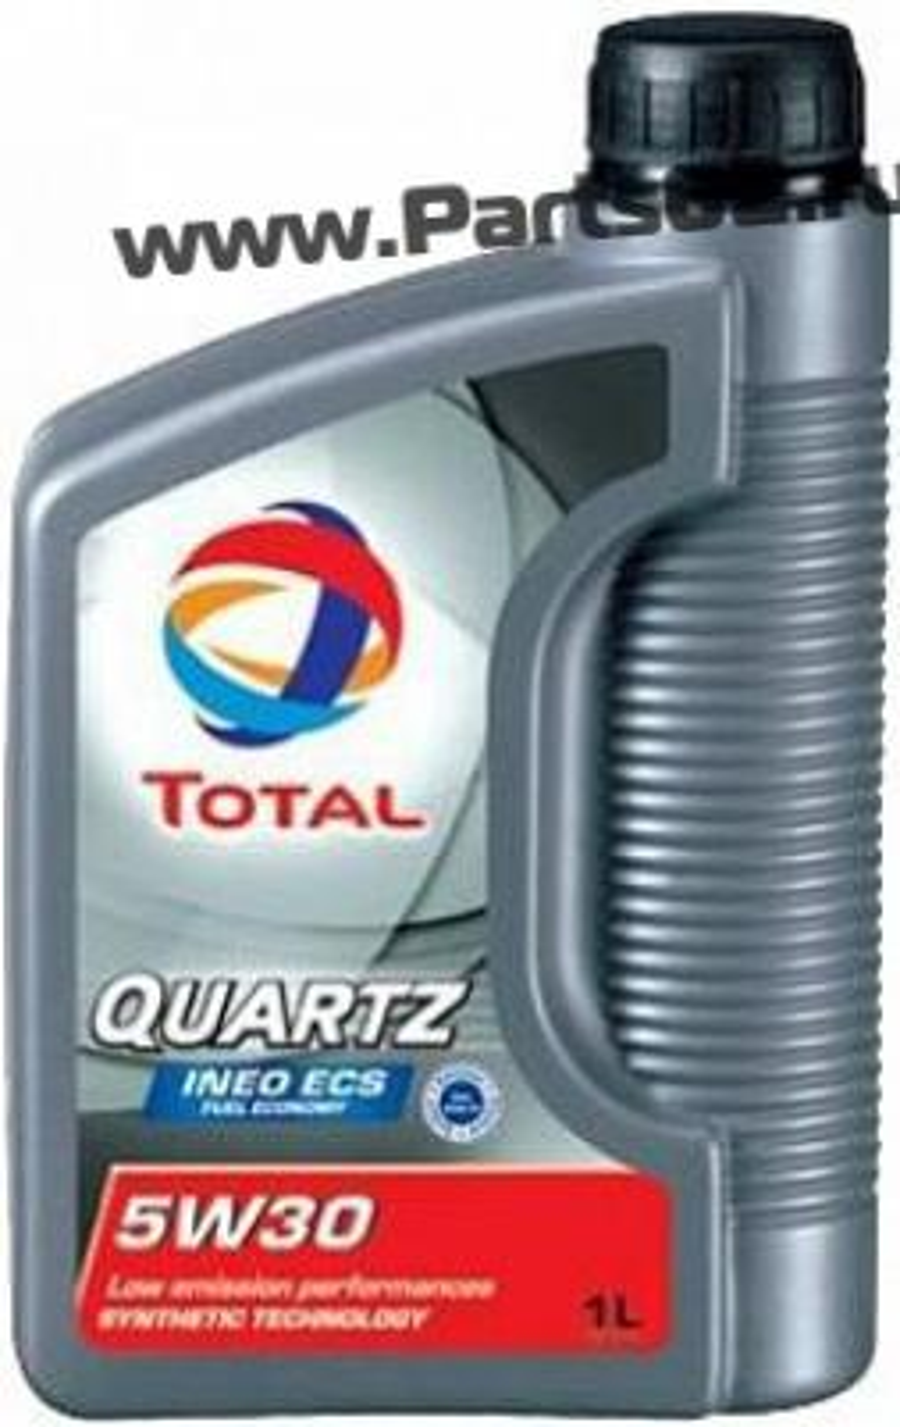 Масло моторное QUARTZ INEO ECS 5W-30 синтетическое, 1 л.